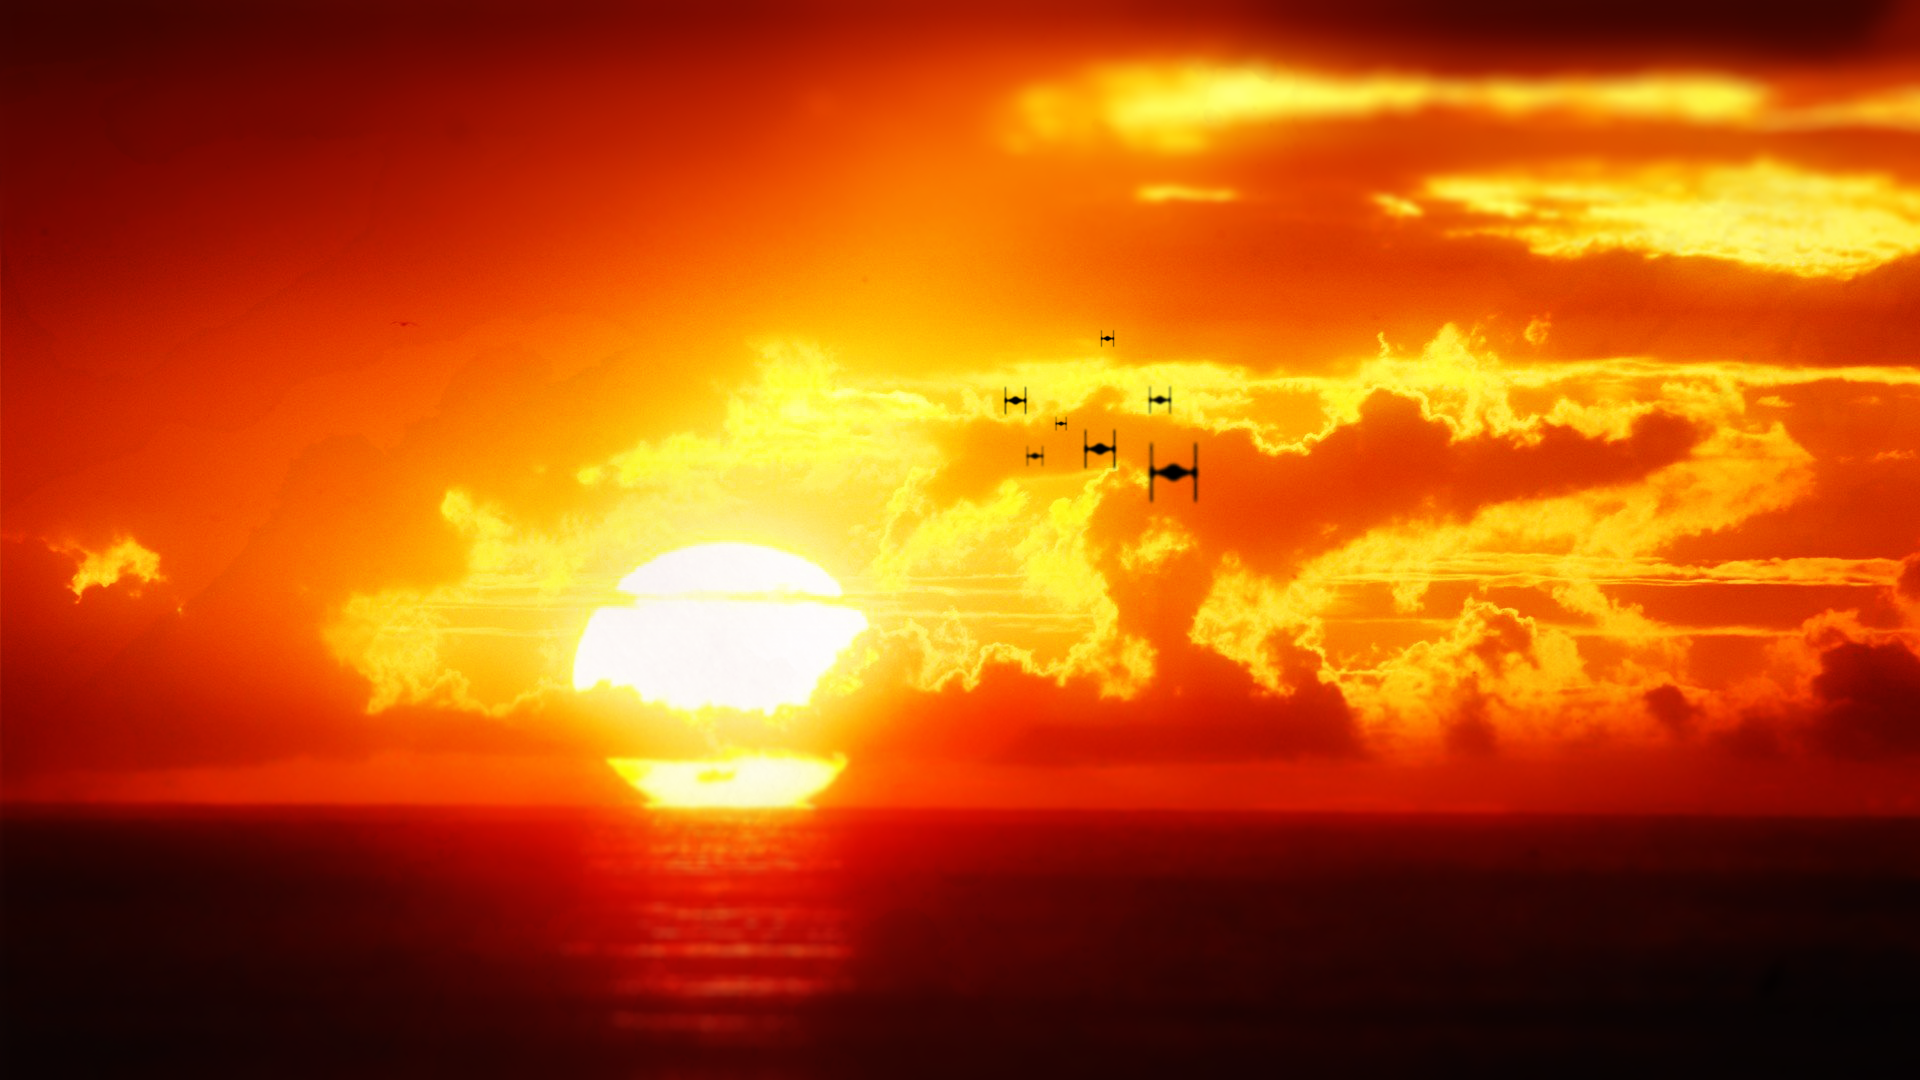 Star Wars Tie Fighter Sunset Wallpaper By Sorrowda On Deviantart